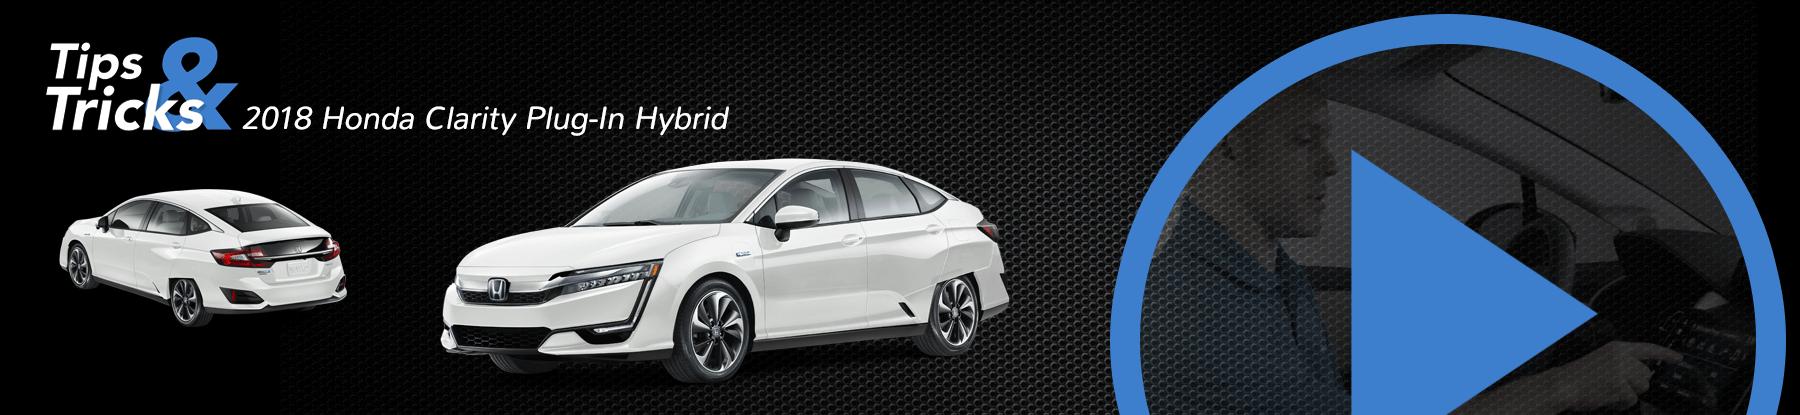 2018 Honda Clarity Hybrid Tips and Tricks Banner